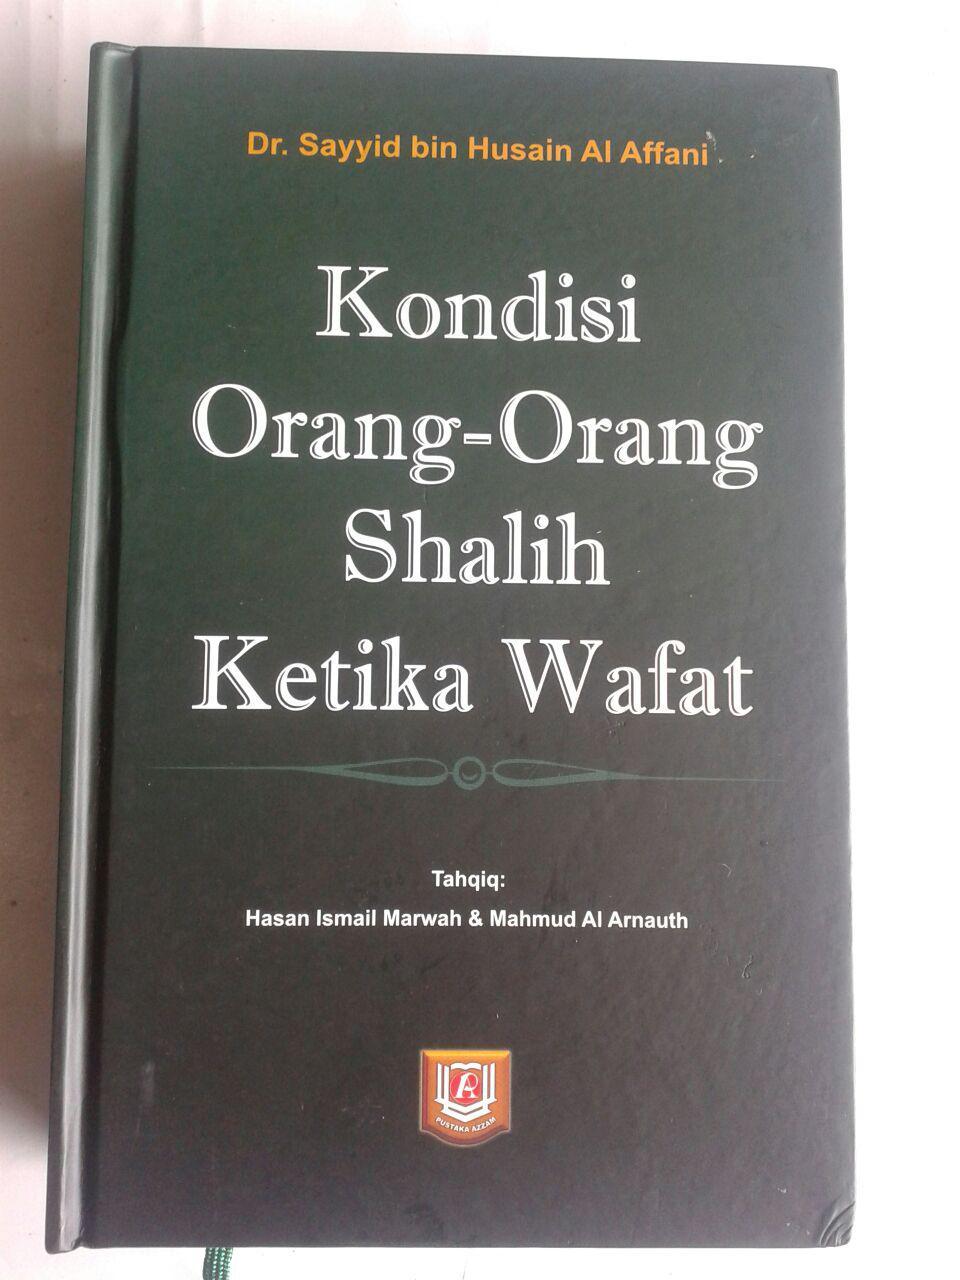 Buku Kondisi Orang-Orang Shalih Ketika Wafat cover 2